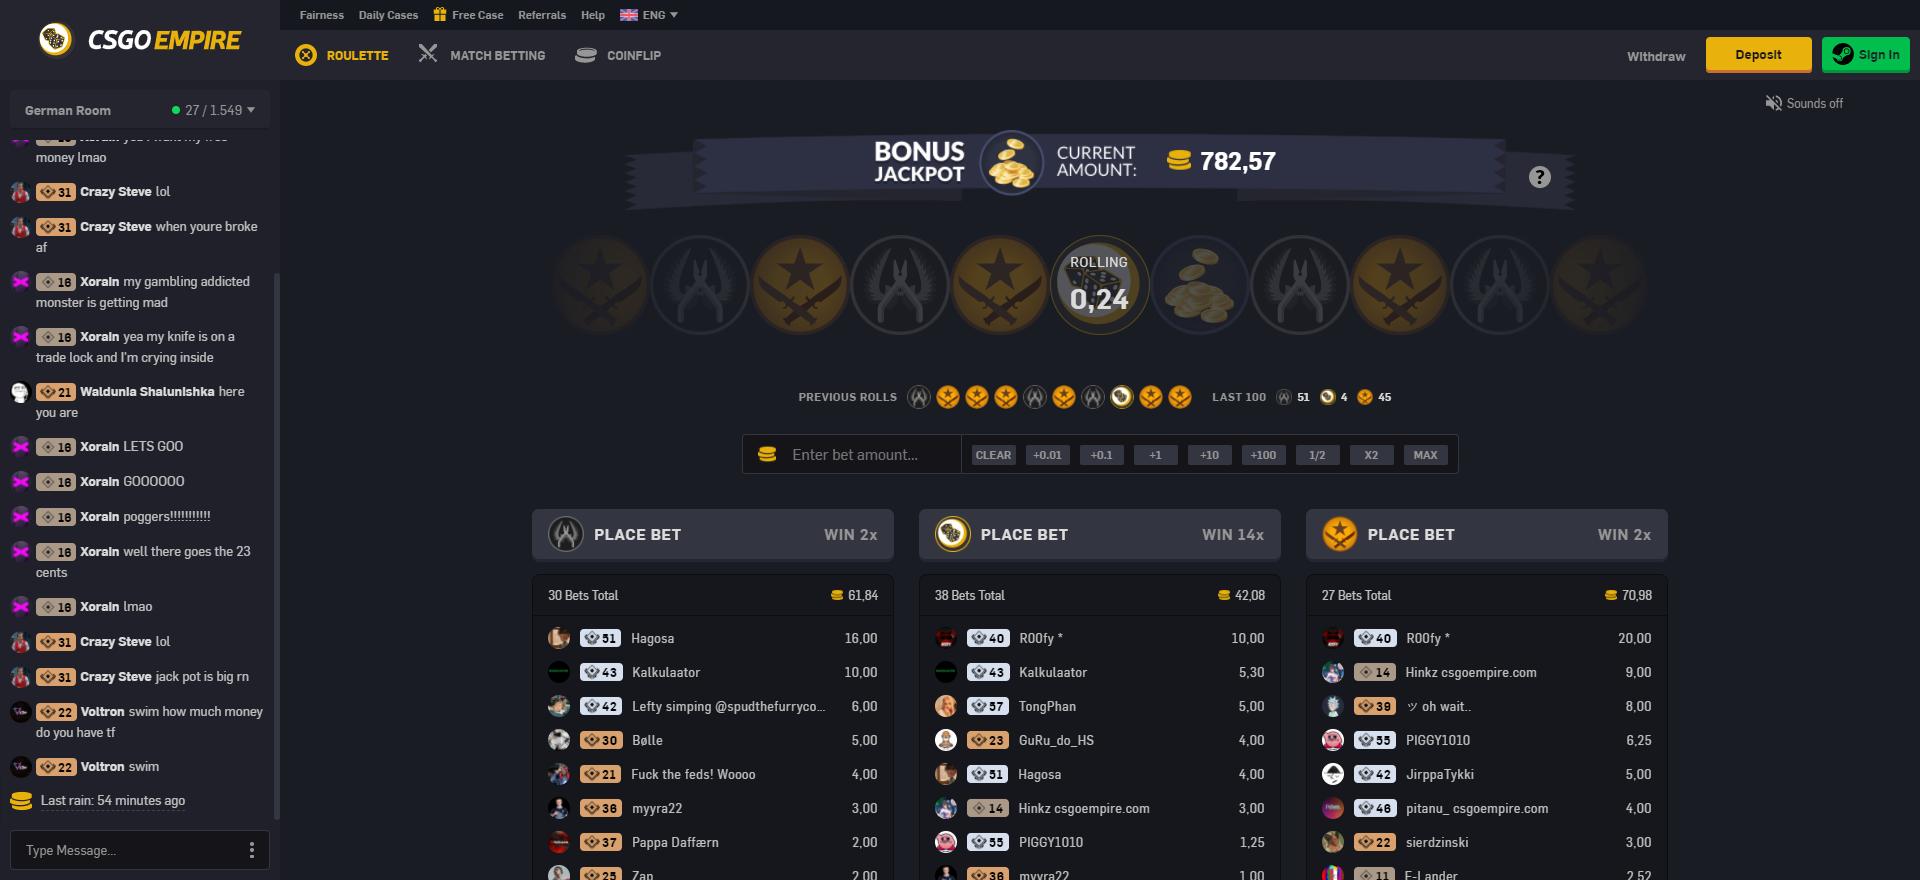 CSGO Gambling Sites CSGOEmpire